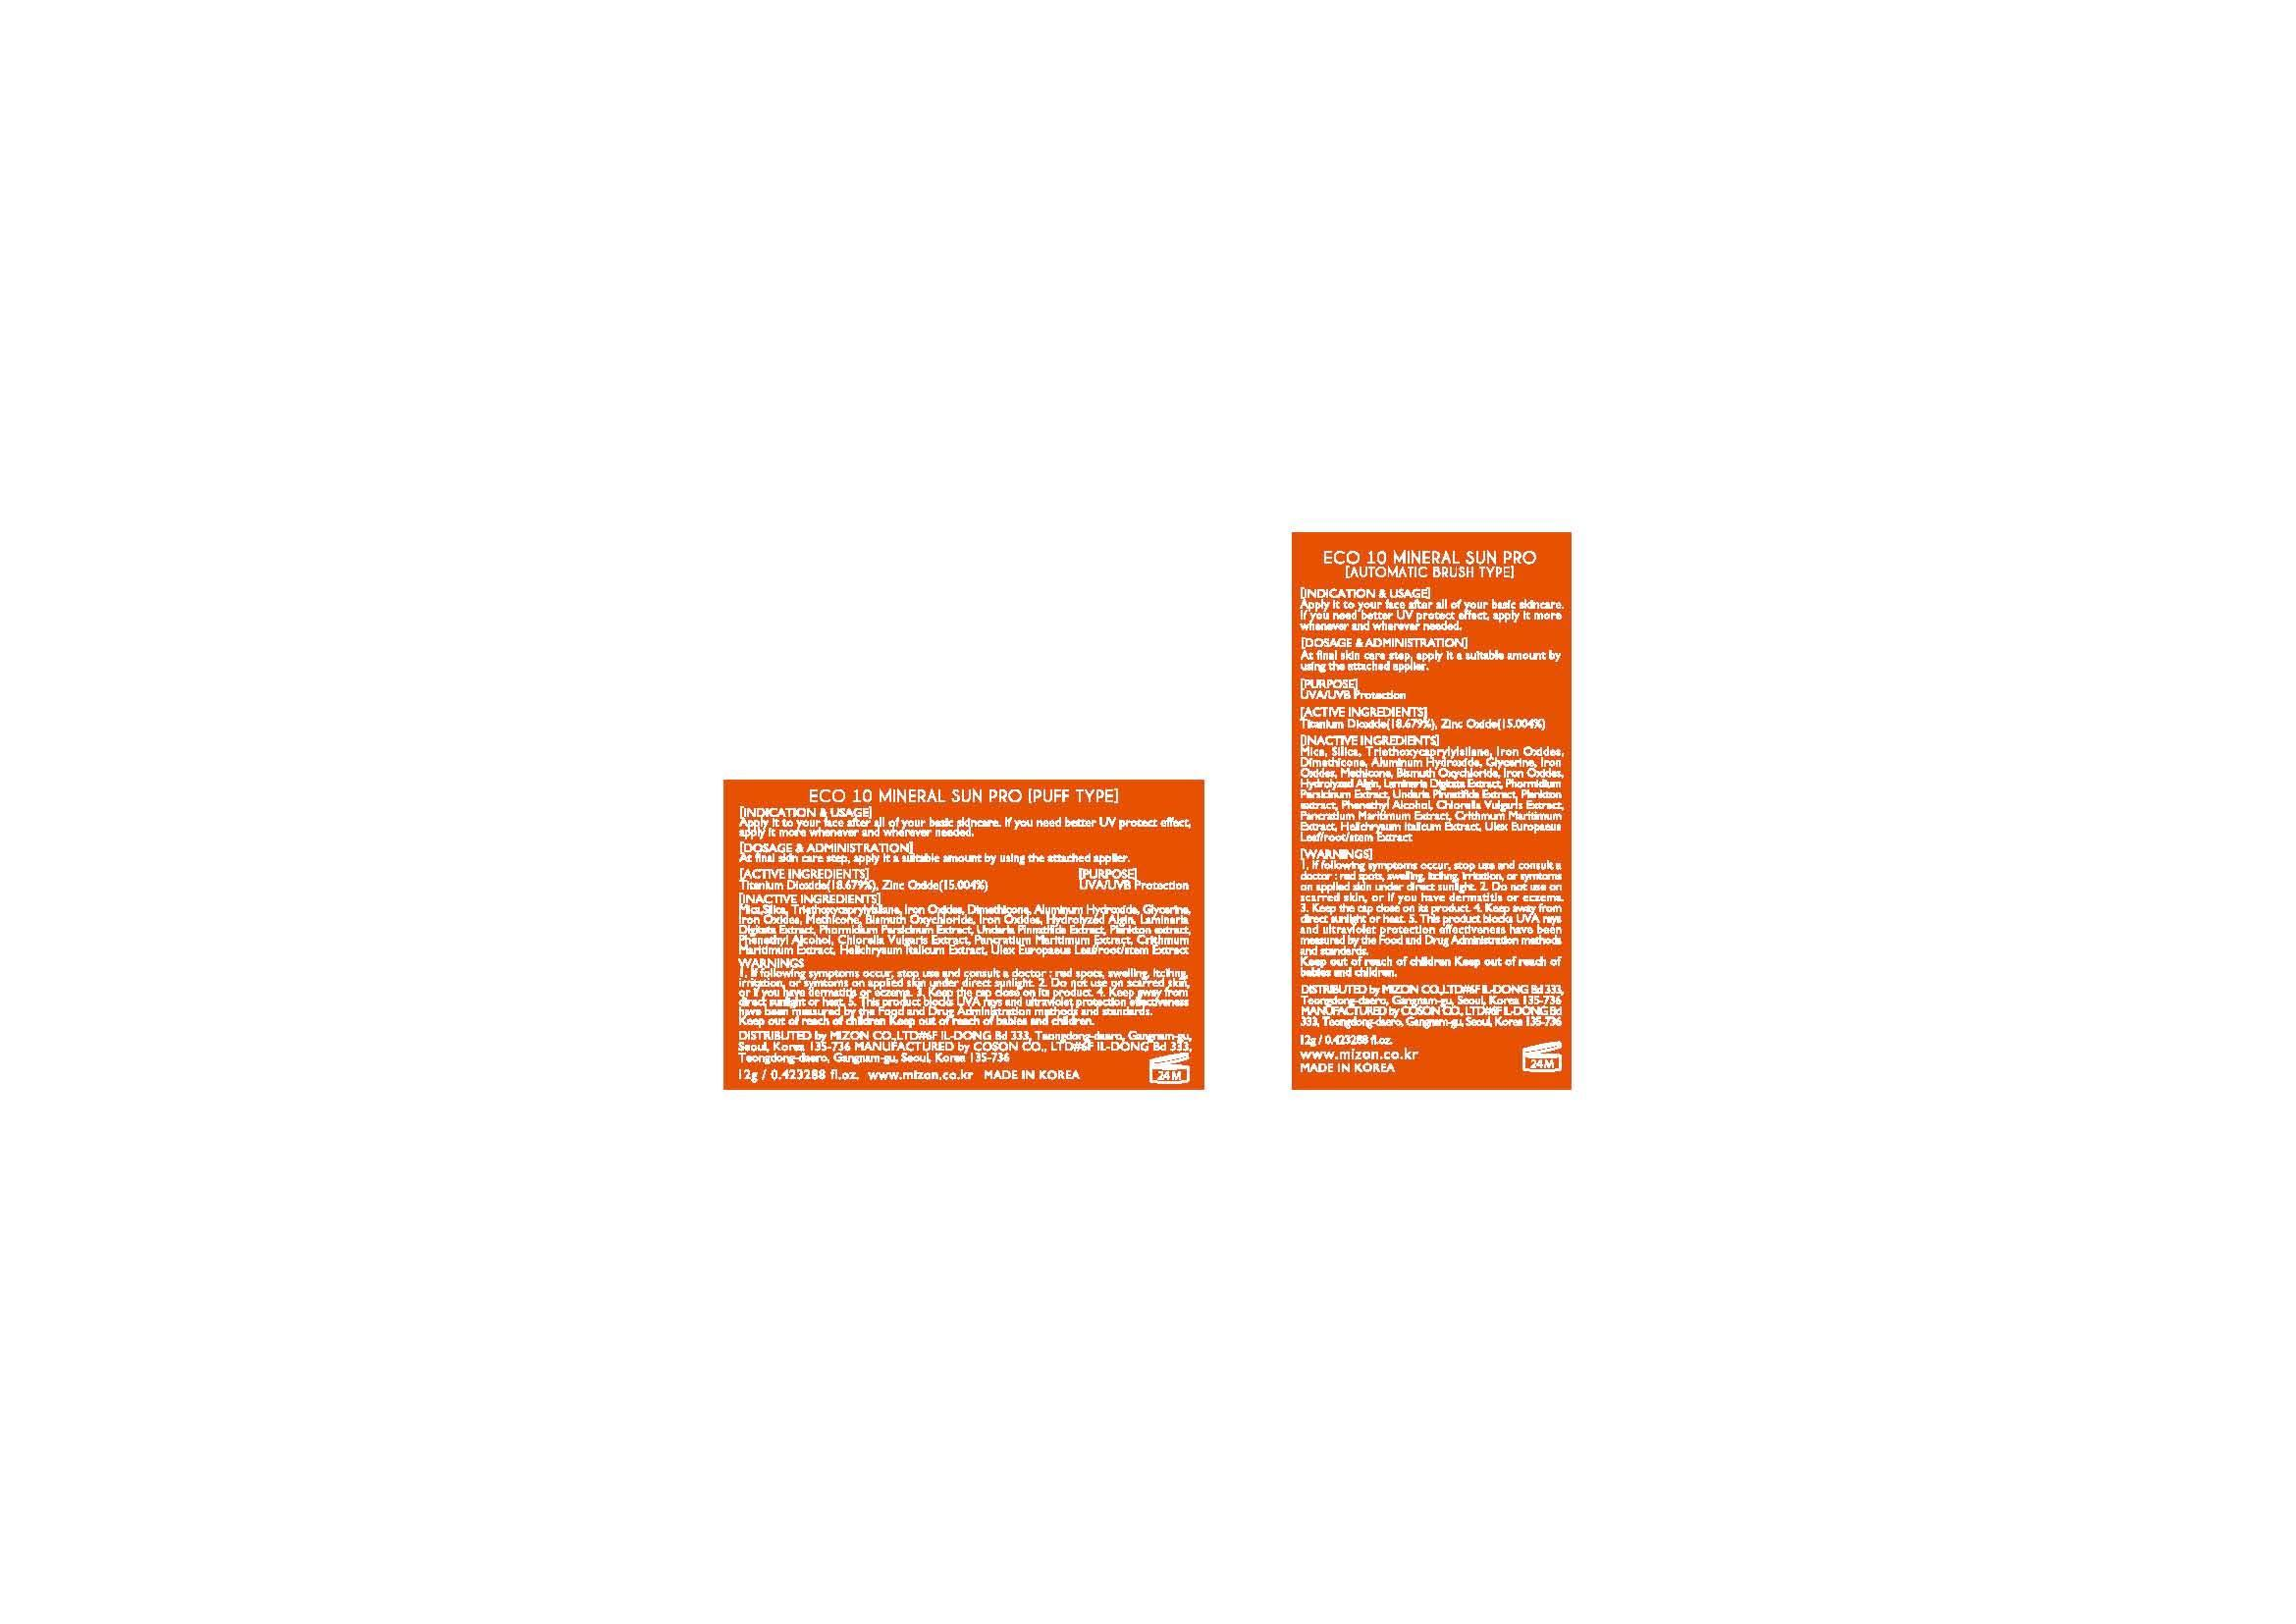 Eco 10 Mineral Sun Pro Puff Type (Zinc Oxide) Powder [Mizon Co., Ltd.]